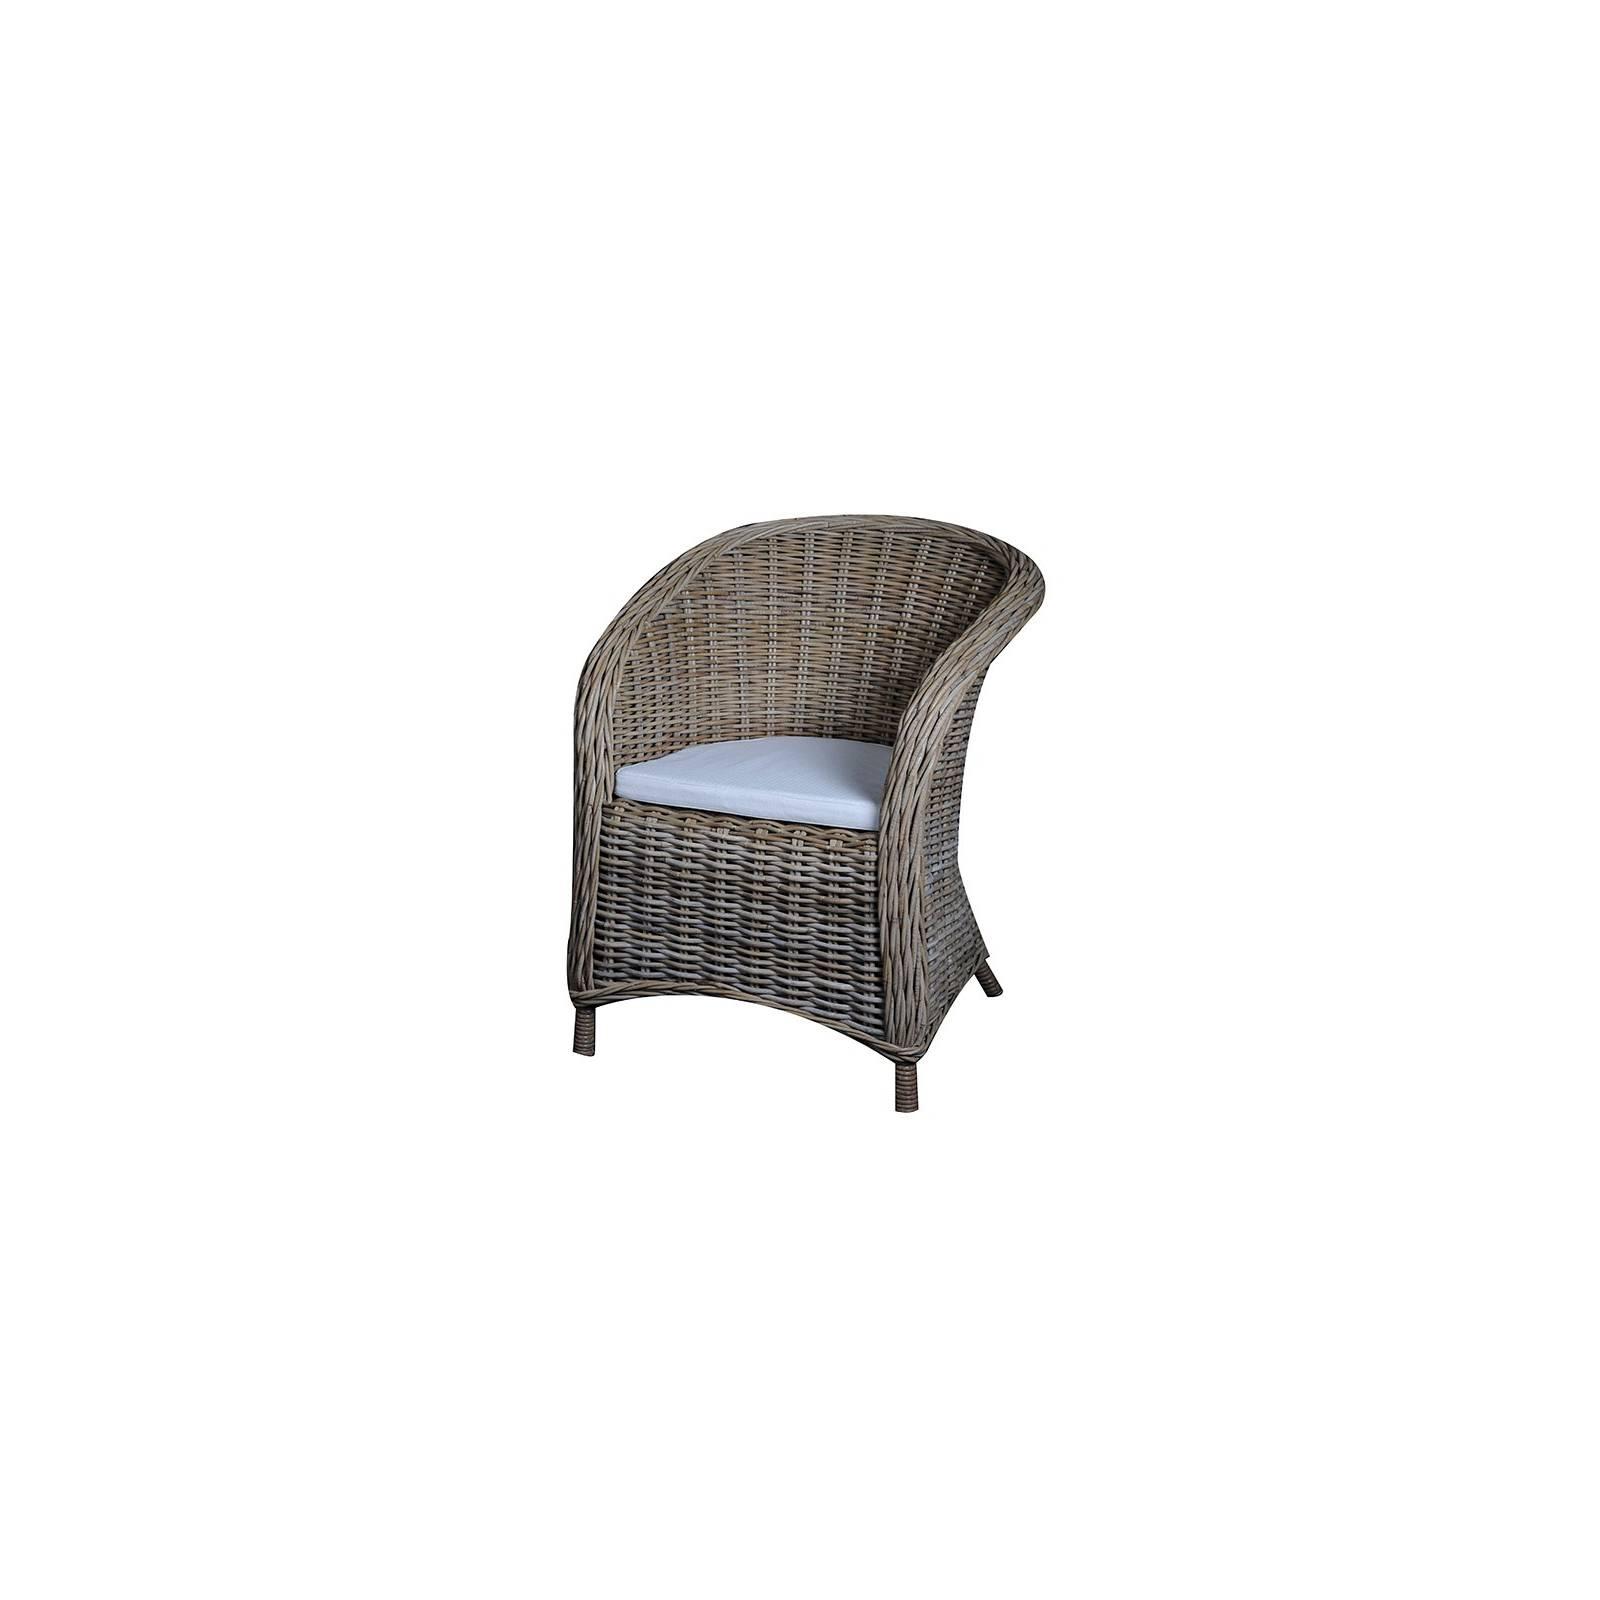 Fauteuil Hampton Kobo Rotin - meuble haut de gamme